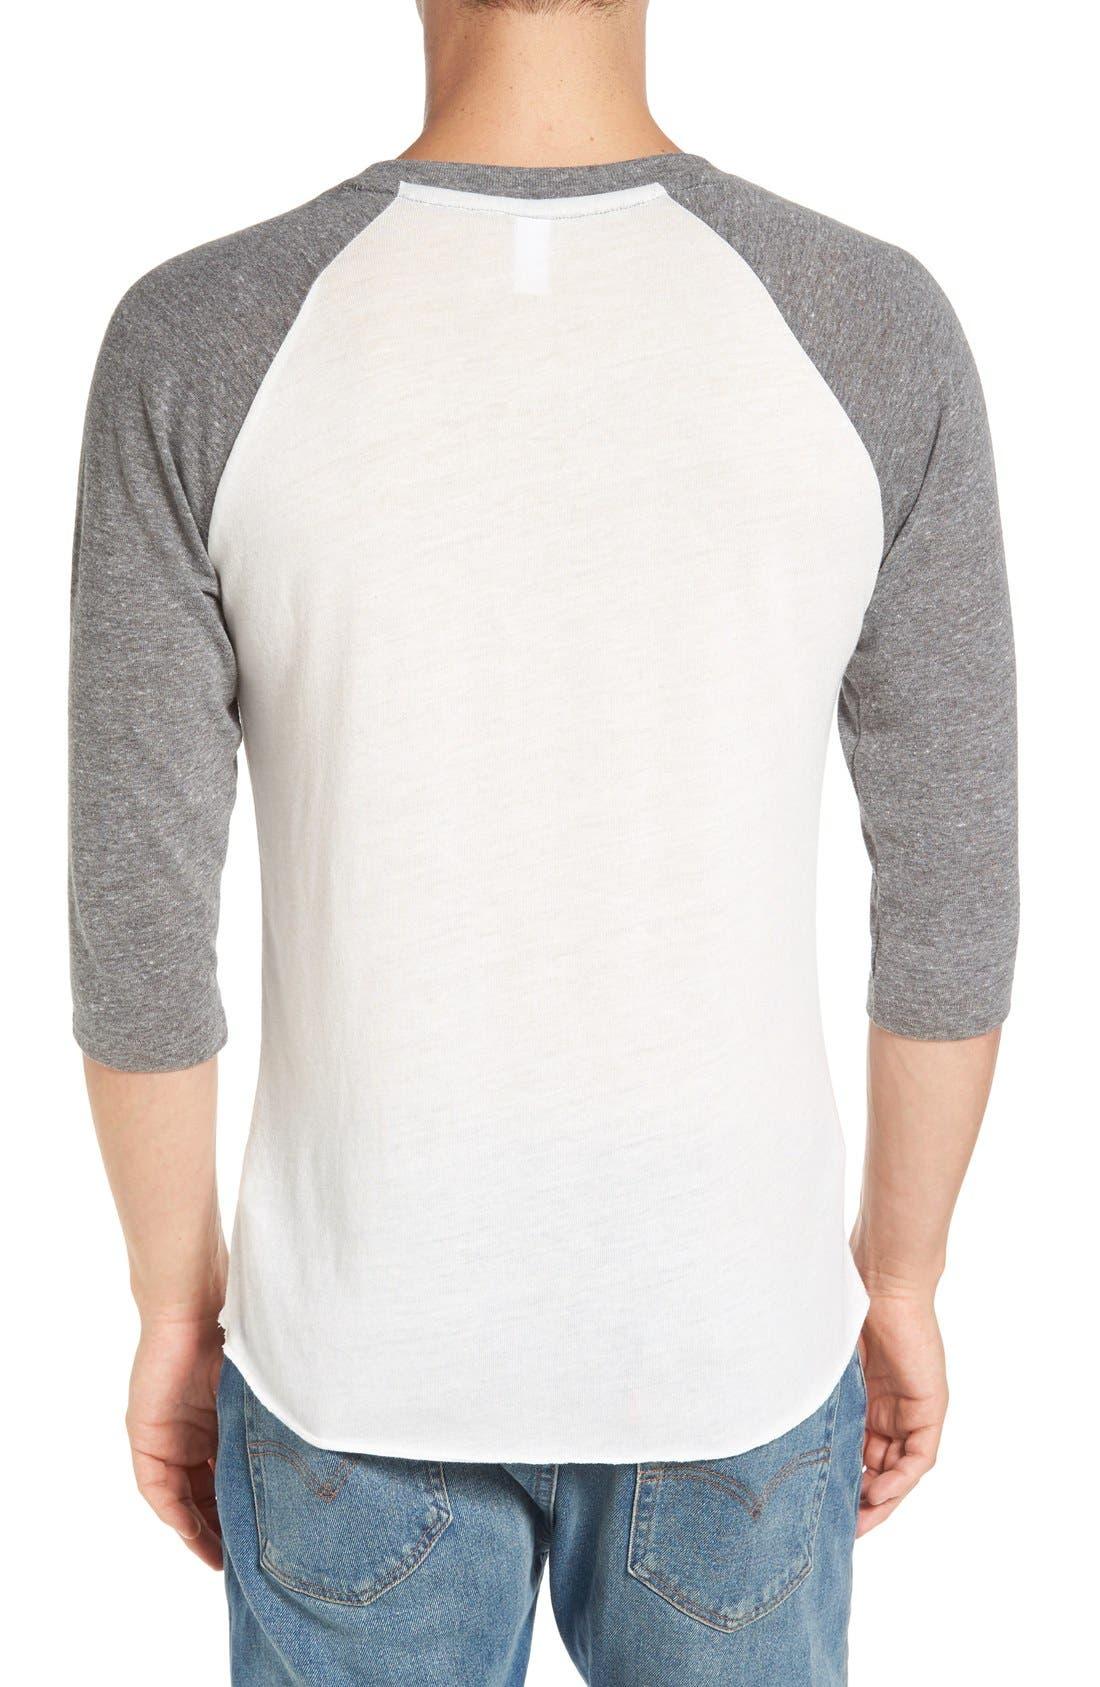 Alternate Image 2  - Alternative Colorblock Baseball T-Shirt